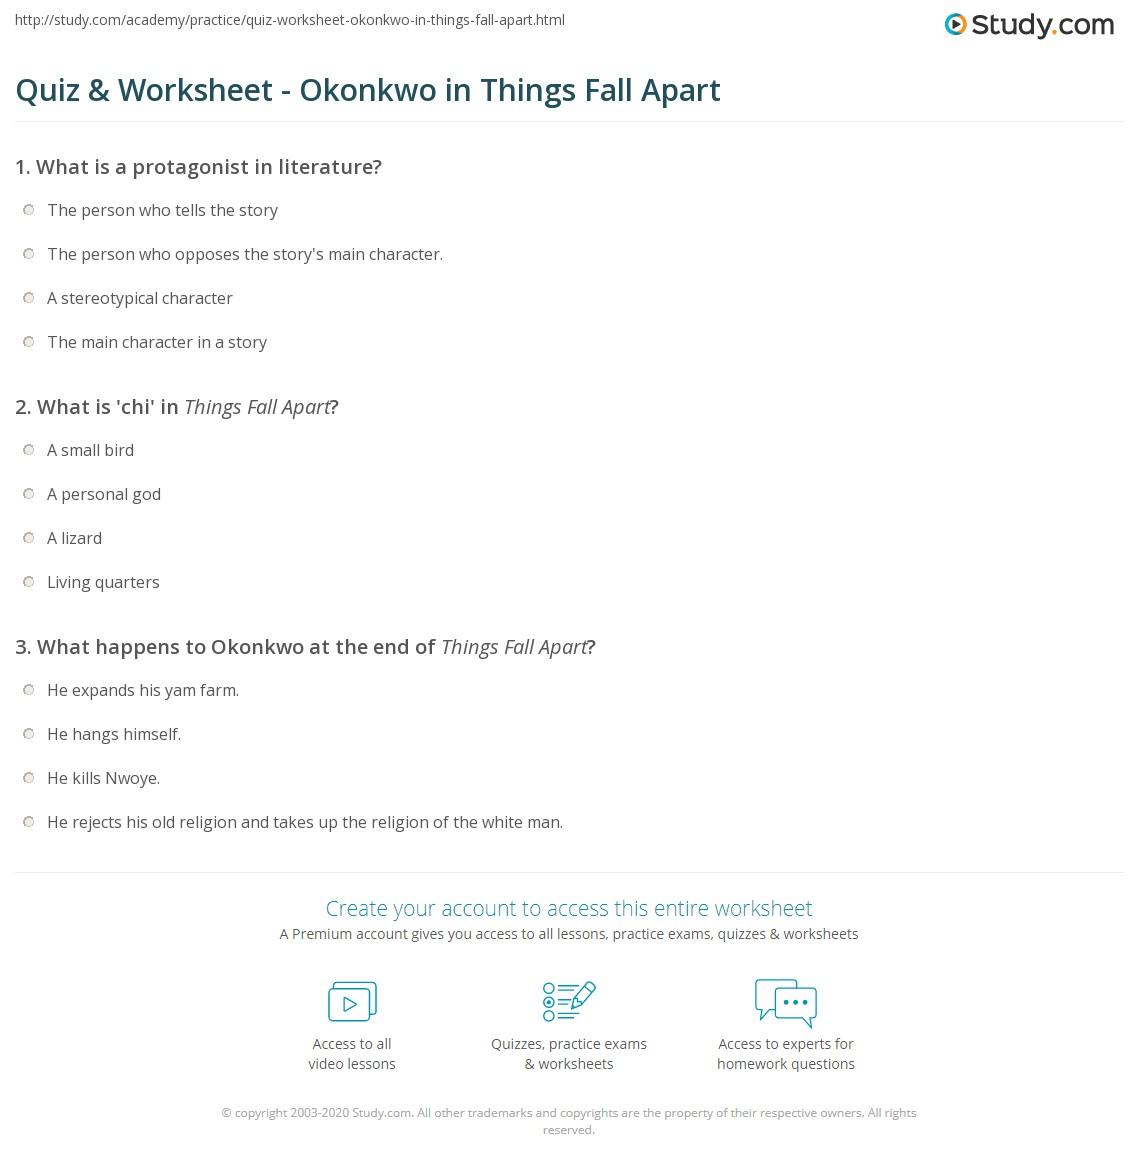 Quiz Worksheet Okonkwo In Things Fall Apart Studycom